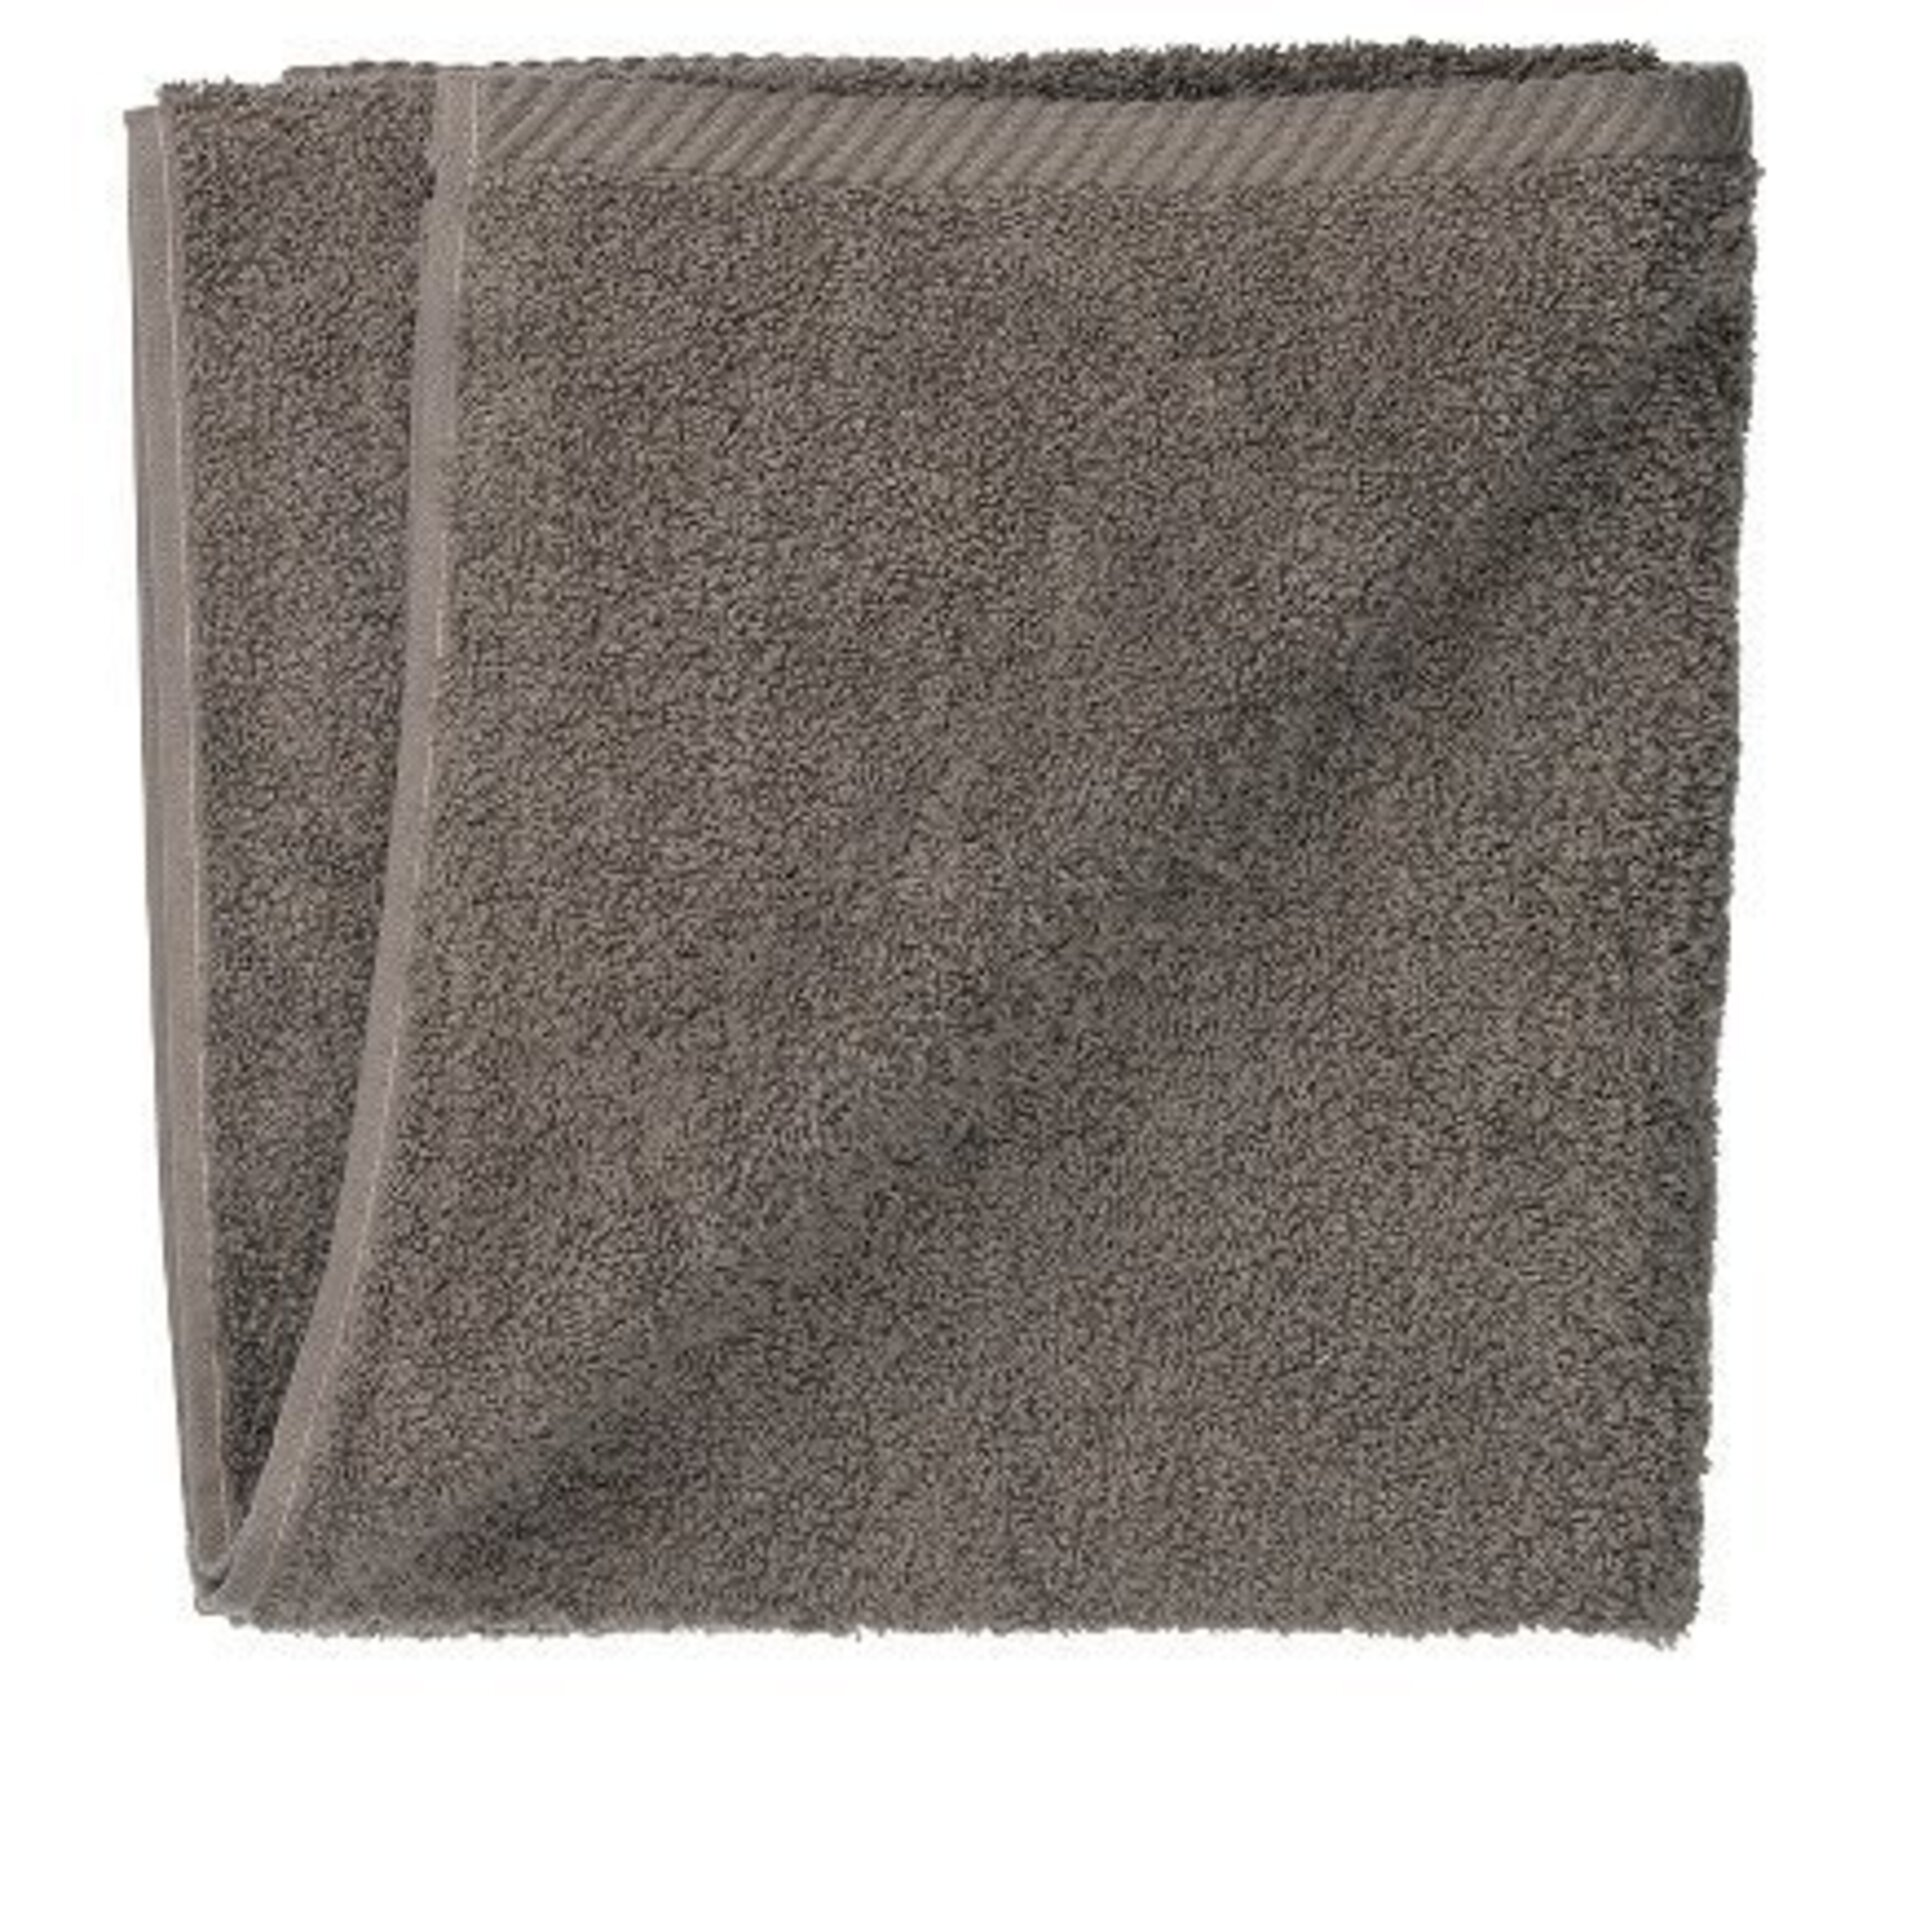 Handtuch Ladessa Kela Textil grau